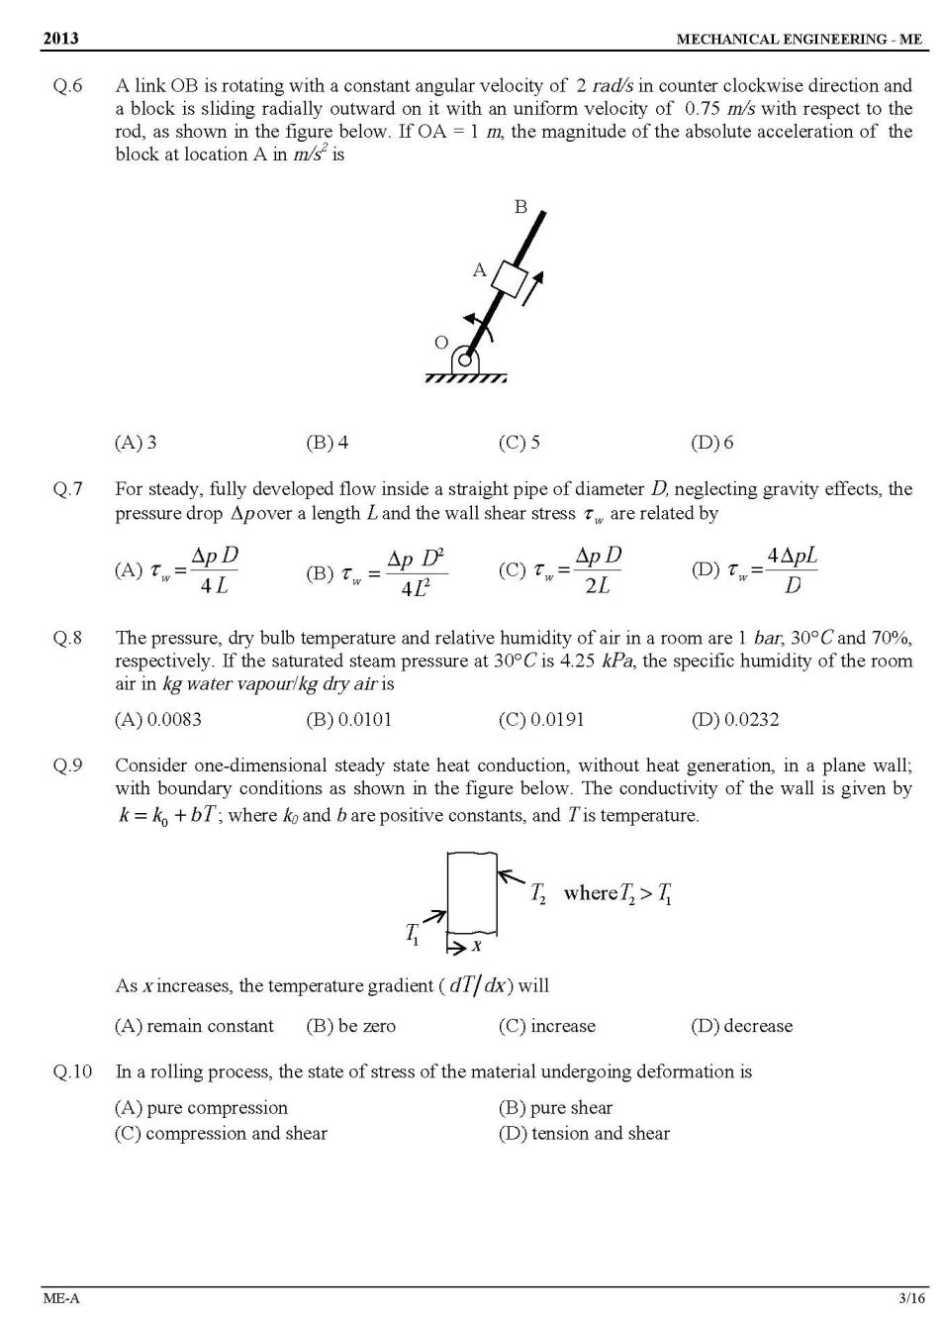 Mechanical Engineering essays topics list